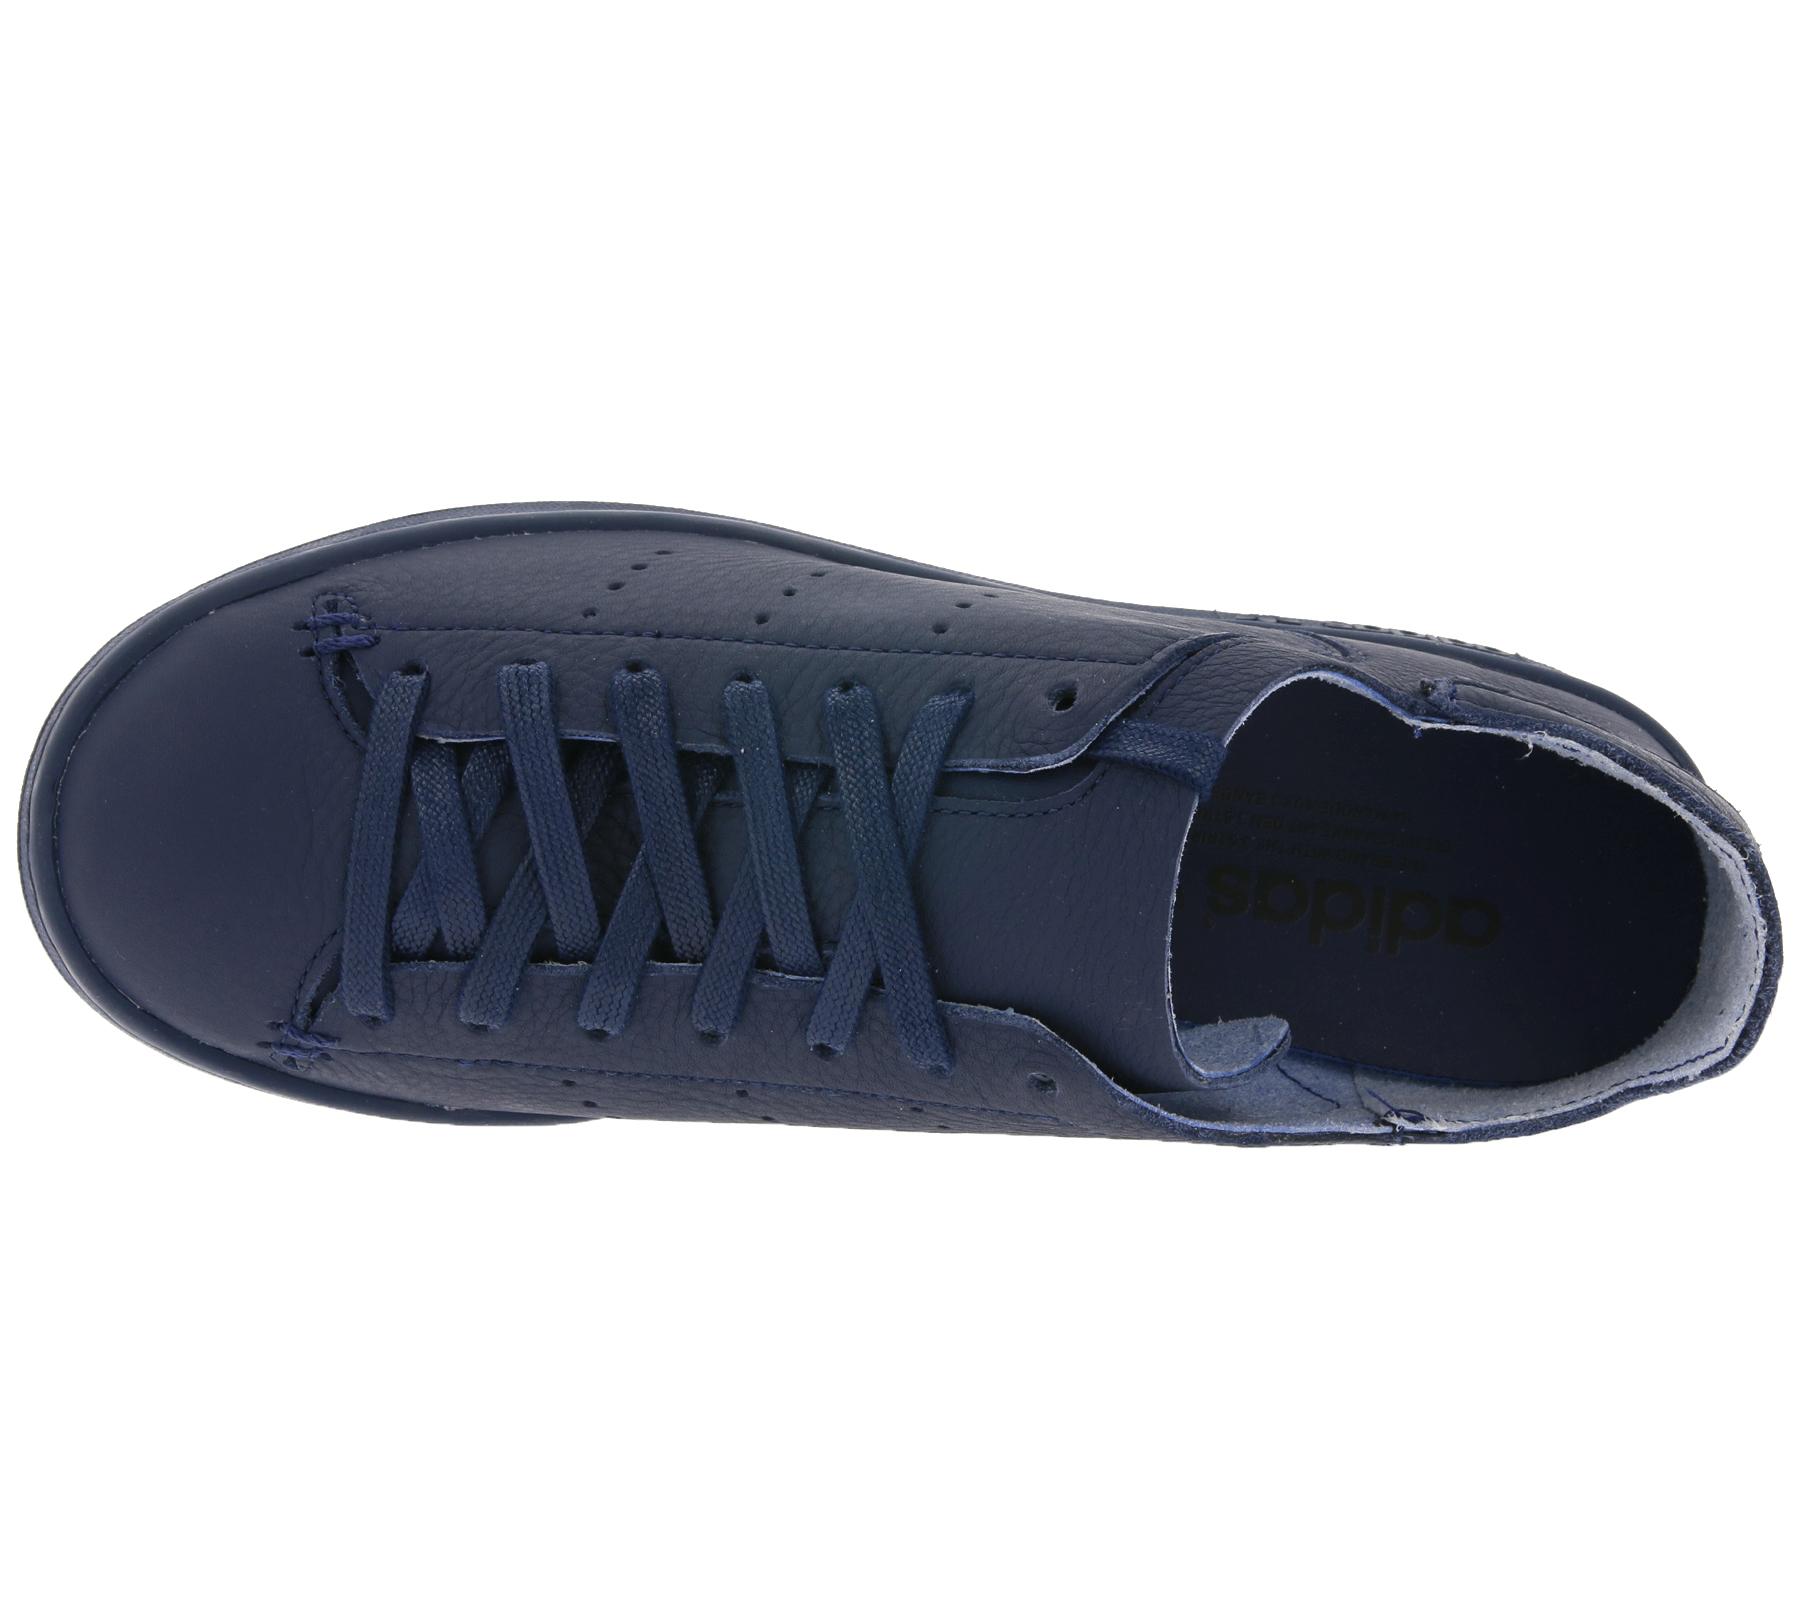 Sock Smith Adidas Schuhe Blau Lea Damen Sneaker Stan Originals Echtleder 6gvyfb7IYm